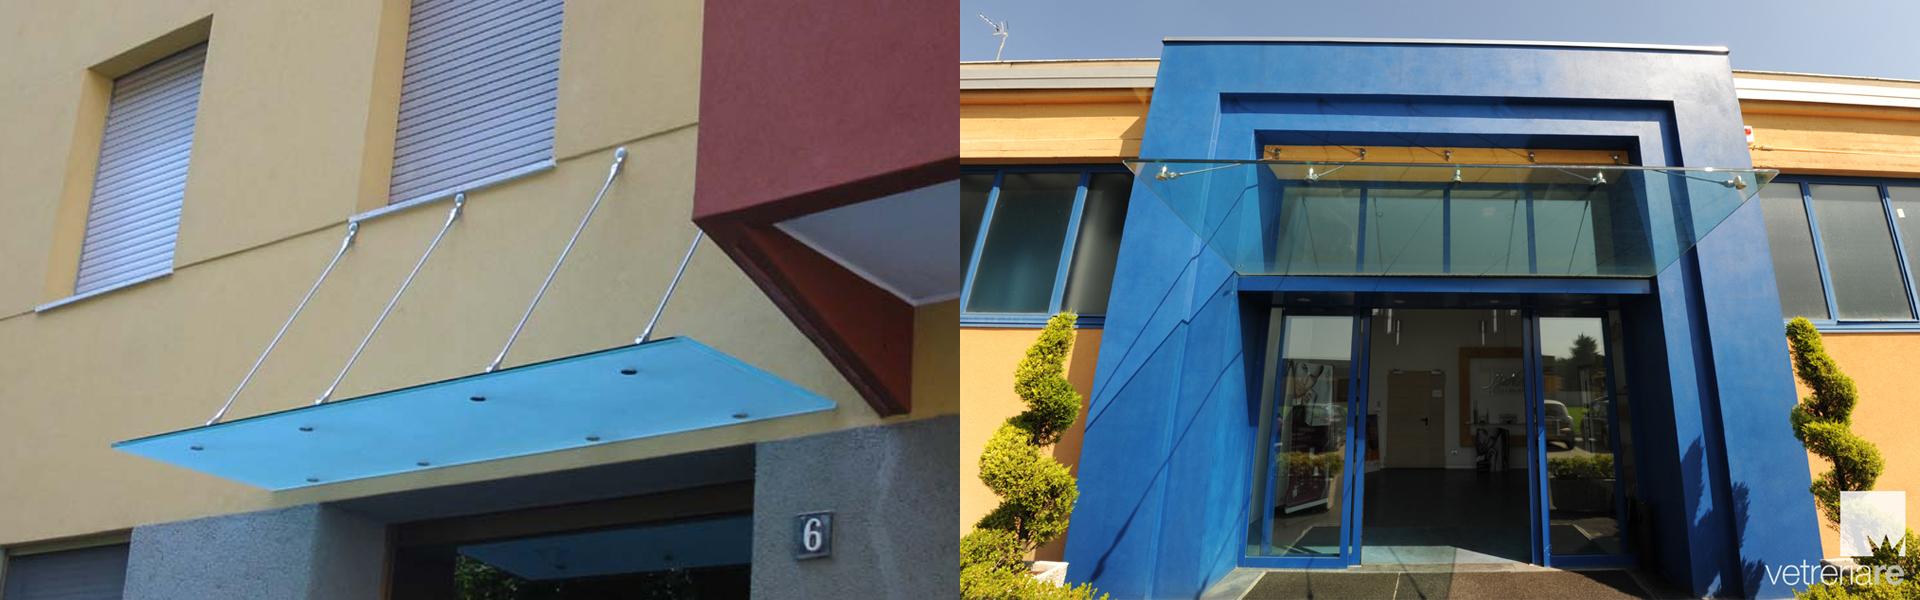 Schutzdächer: hängende Fassaden